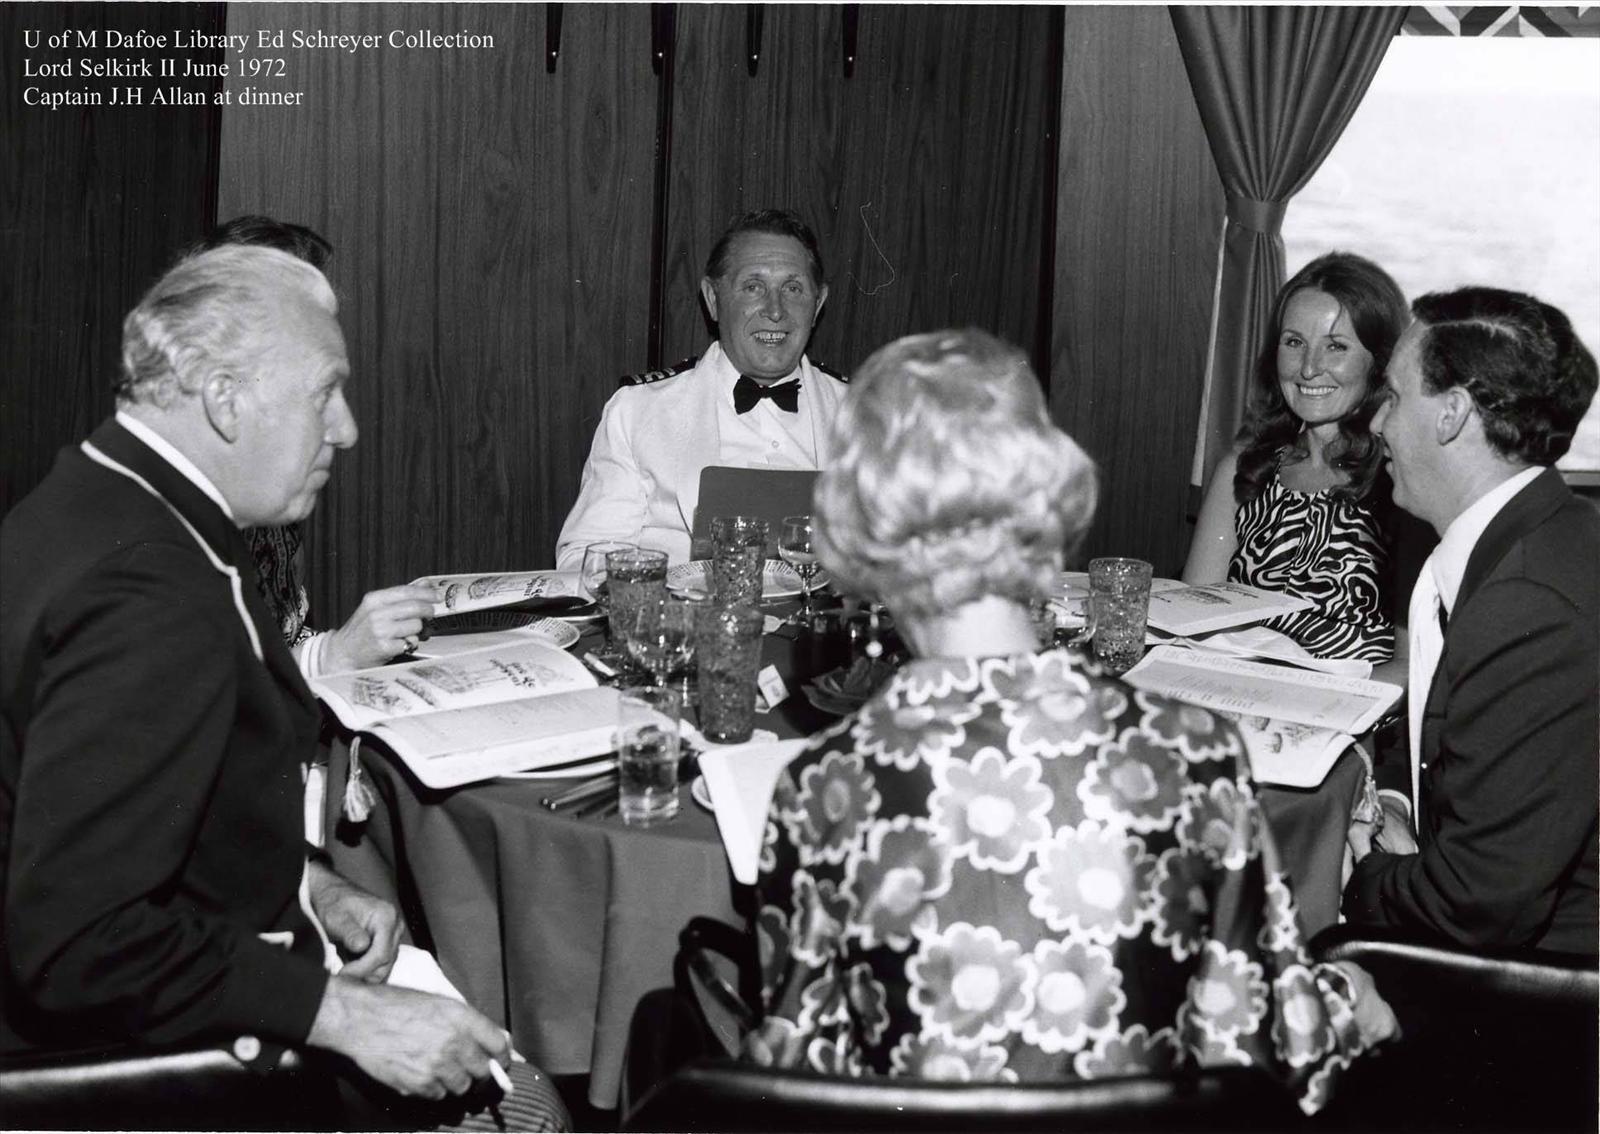 tn_1200_umedschreyer_jh_allan_capt_dinner_ls_1972.jpg